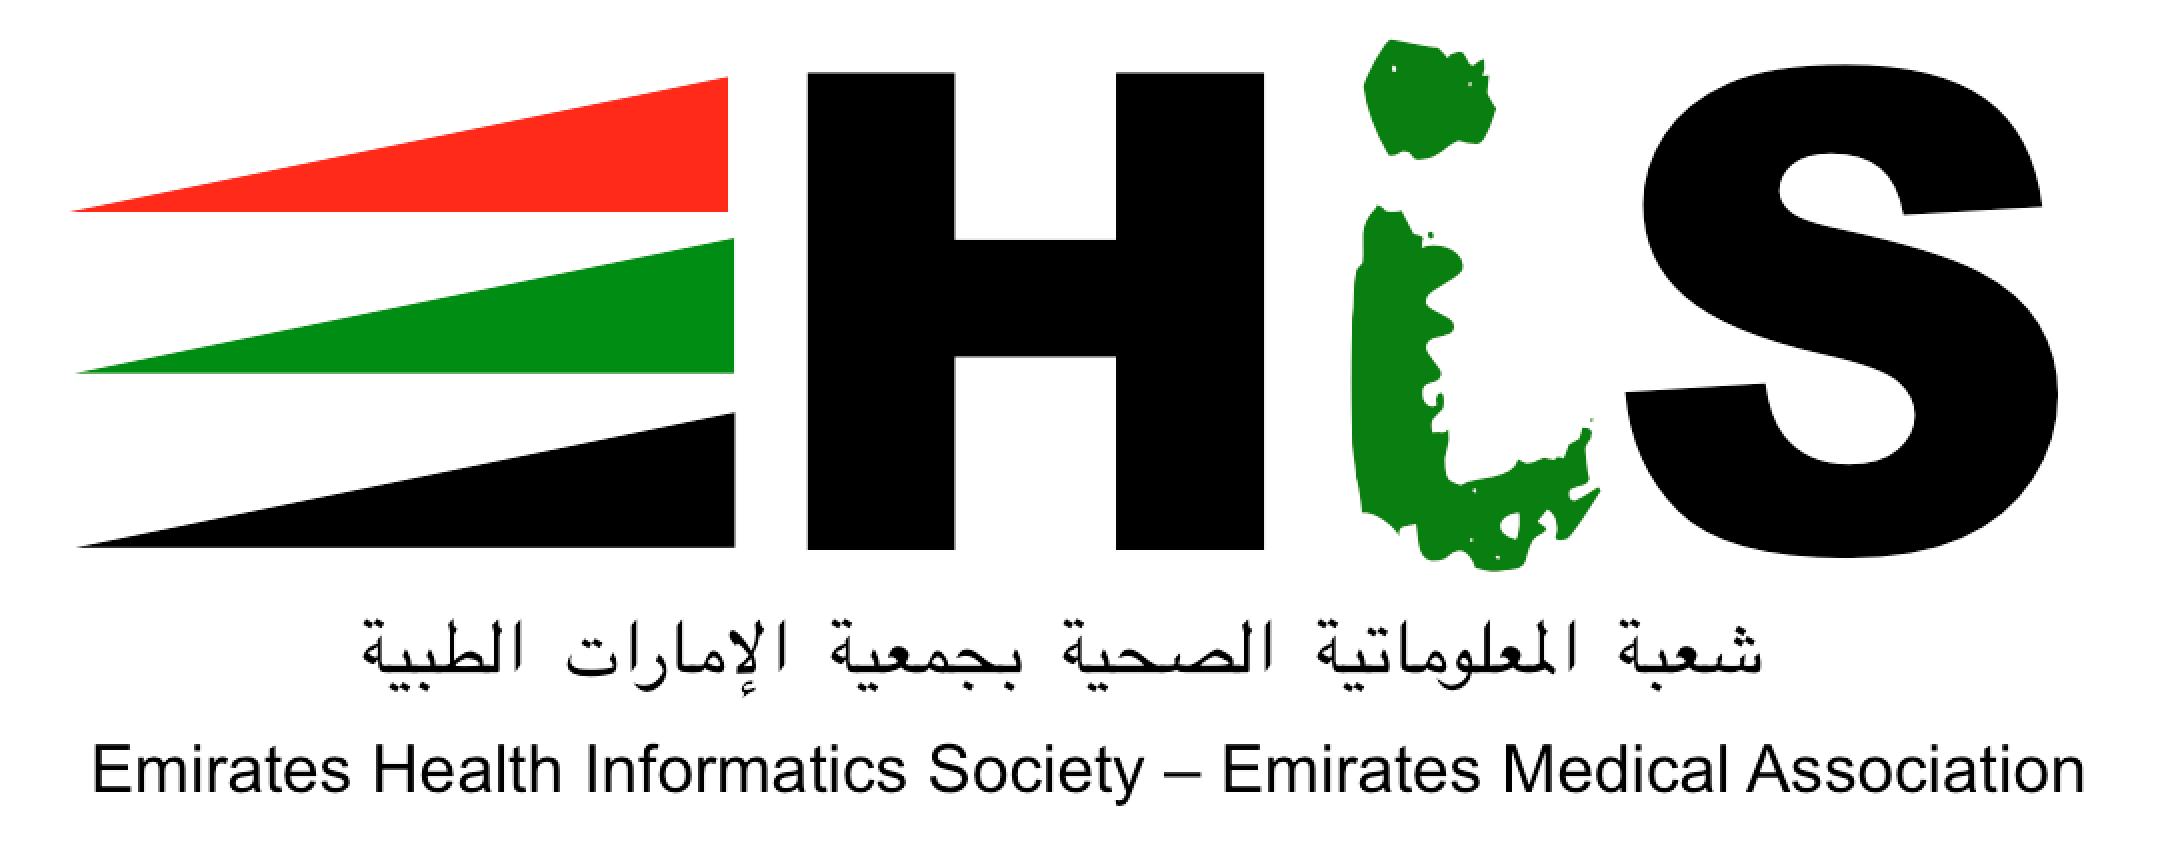 The Saudi Association for Health Informatics (SAHI) - IMIA